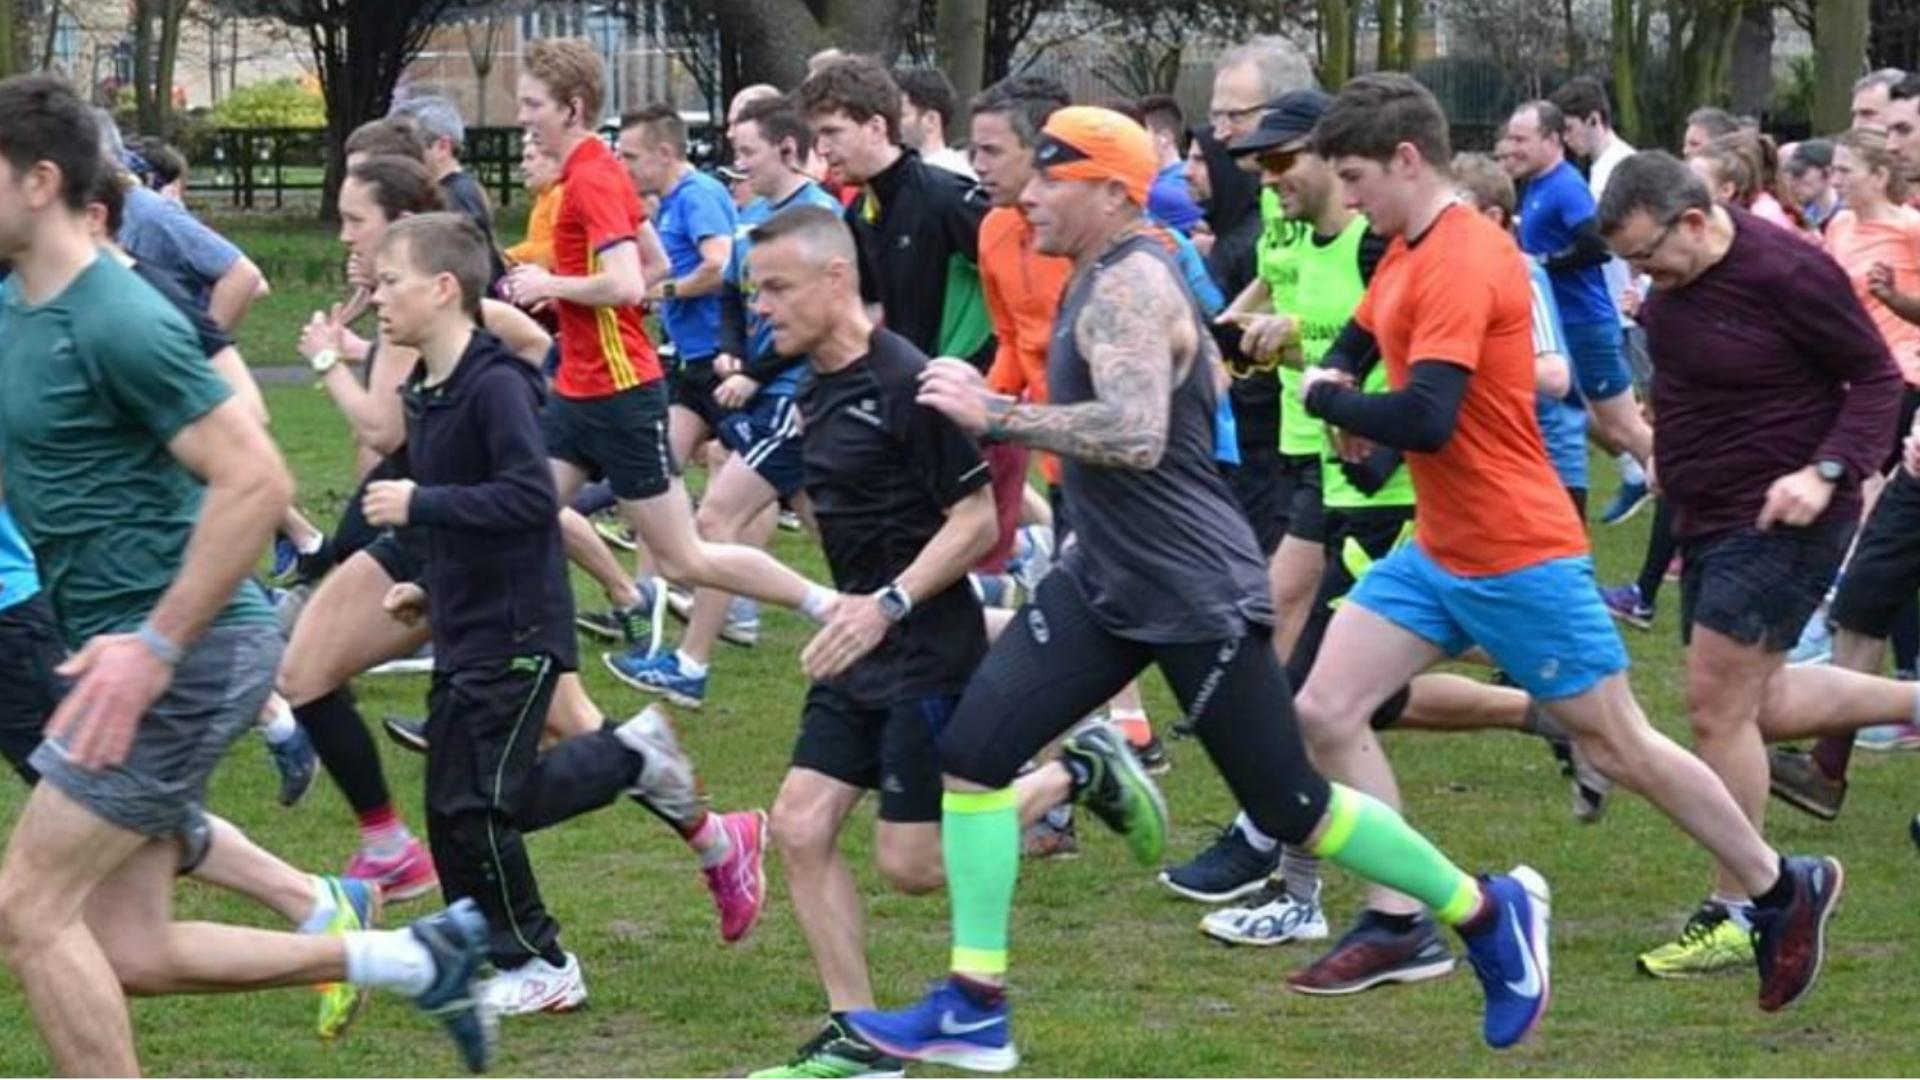 La fotografia mostrada por el periodista, Flint usa las medias verdes (Foto: Facebook Chelmsford Central Park Run)